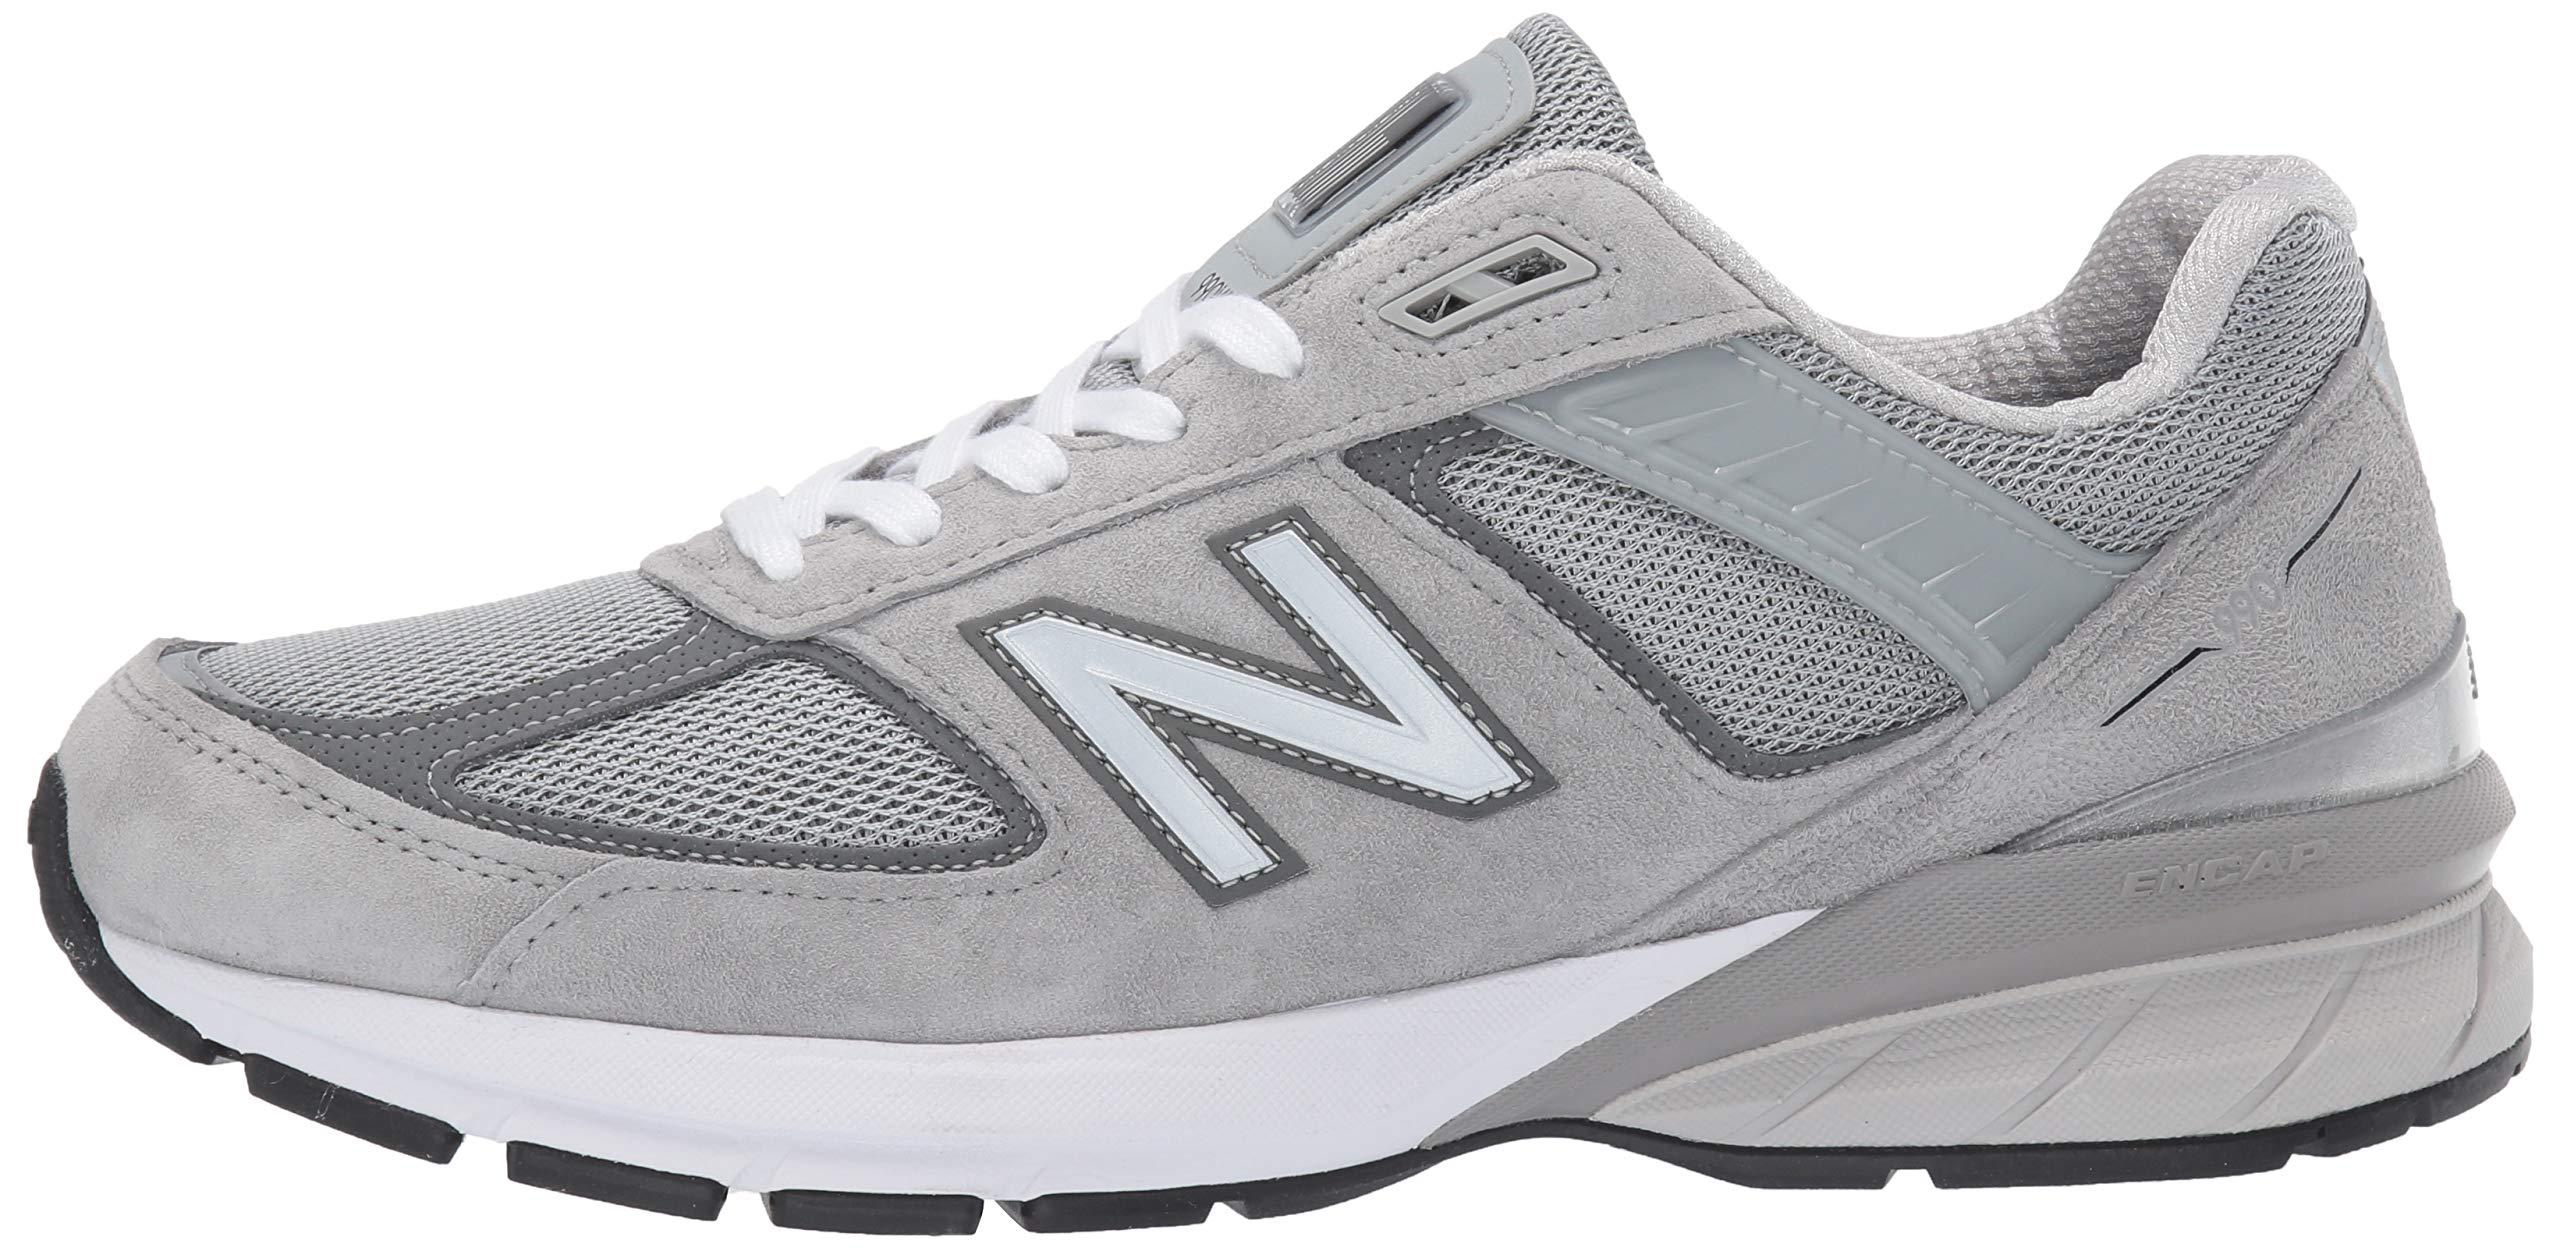 super popular a1f38 deb33 Amazon.com  New Balance Athletic Shoe, Inc.